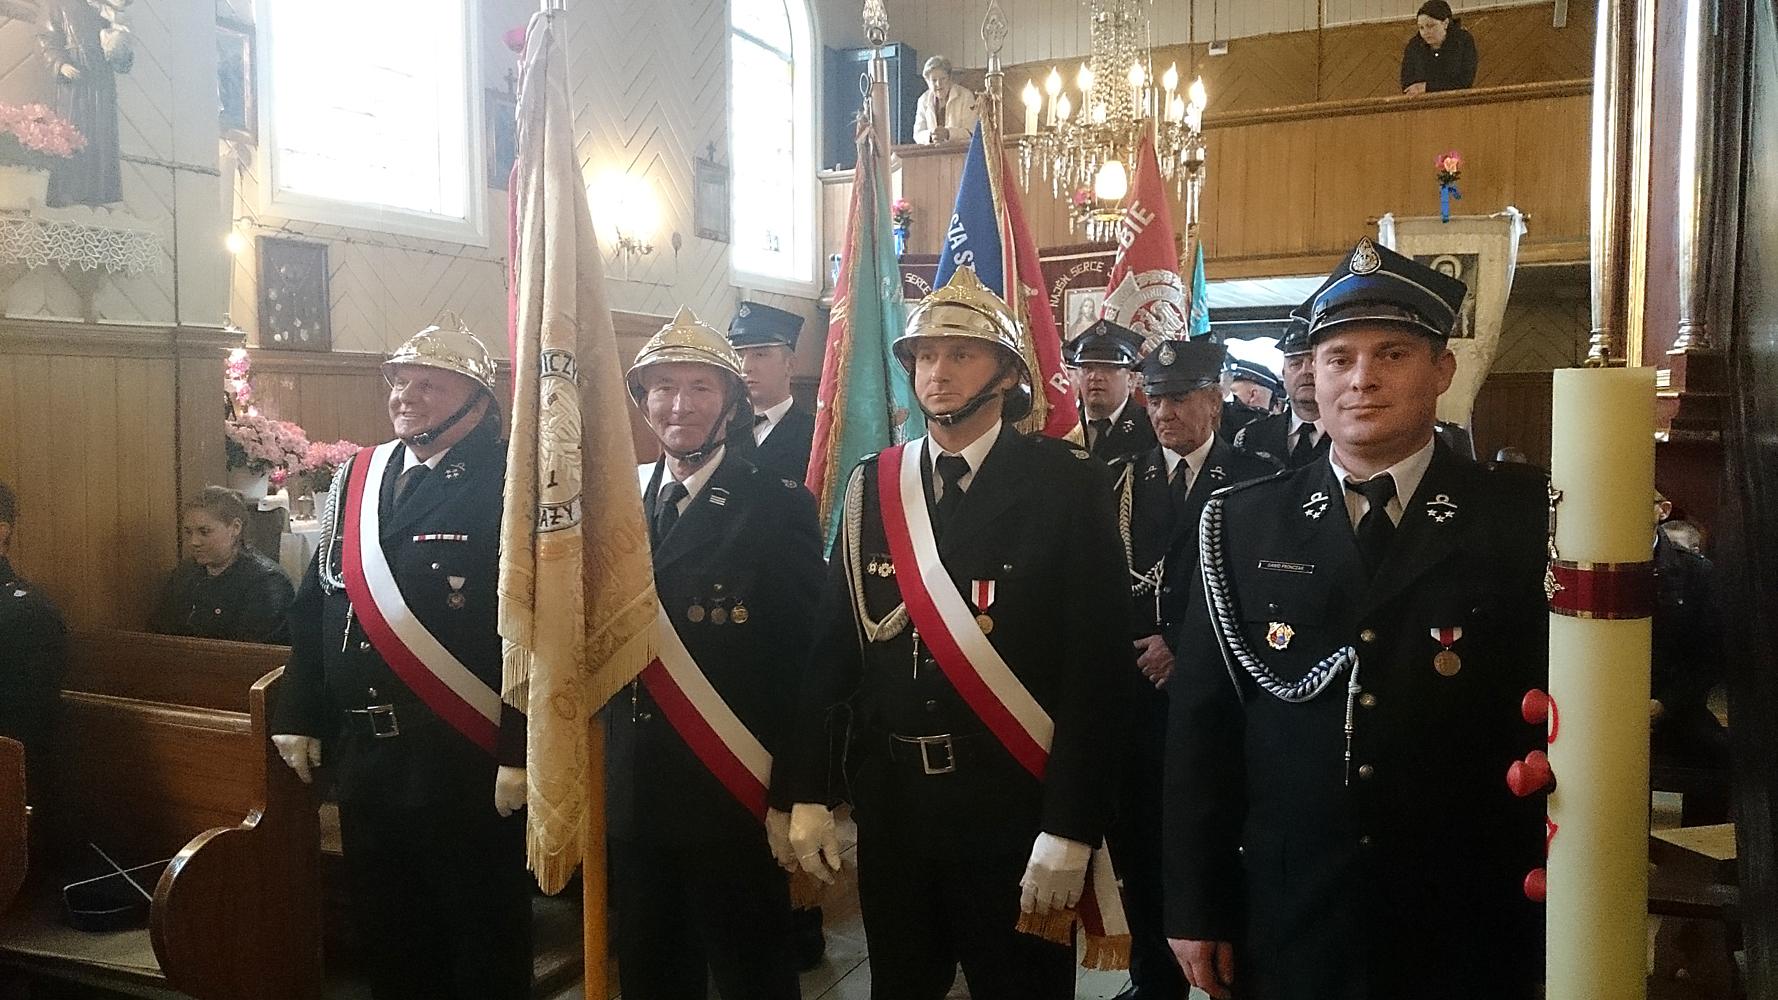 Parafialne obchody Dnia Strażaka wRychłocicach